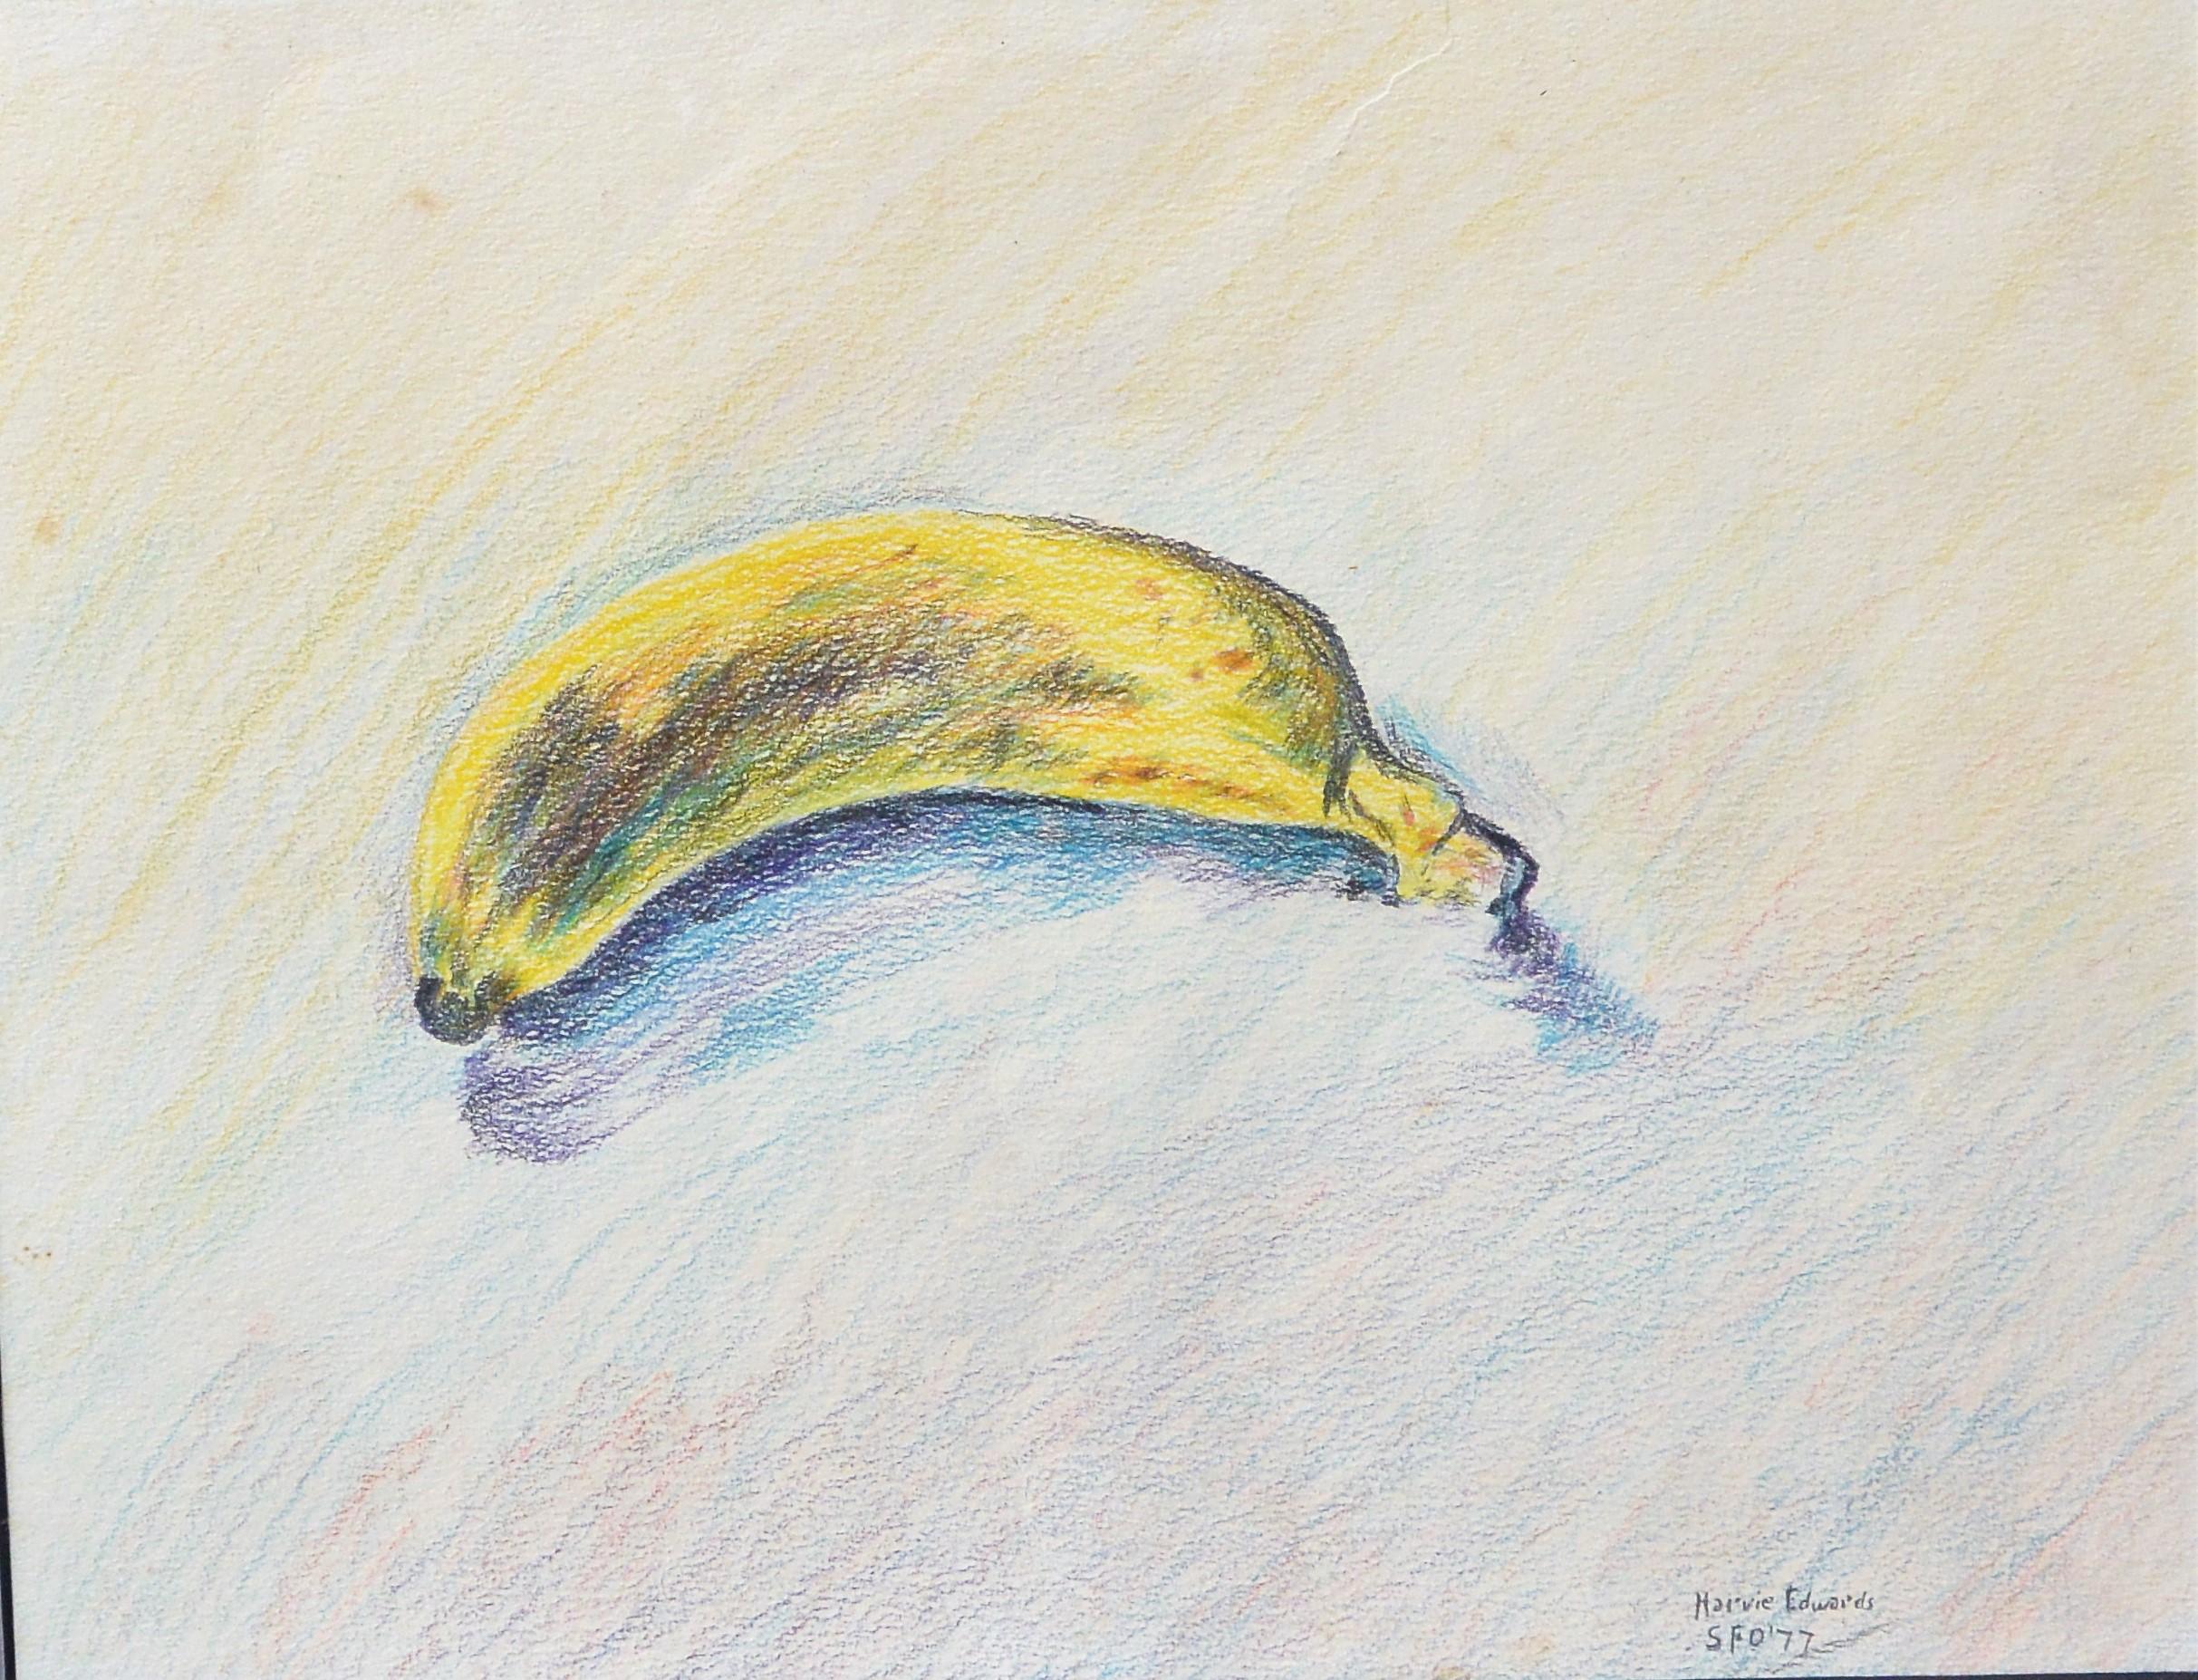 Harvie Edwards Banana Dibujo Lápices Colores Papel Enmarcado